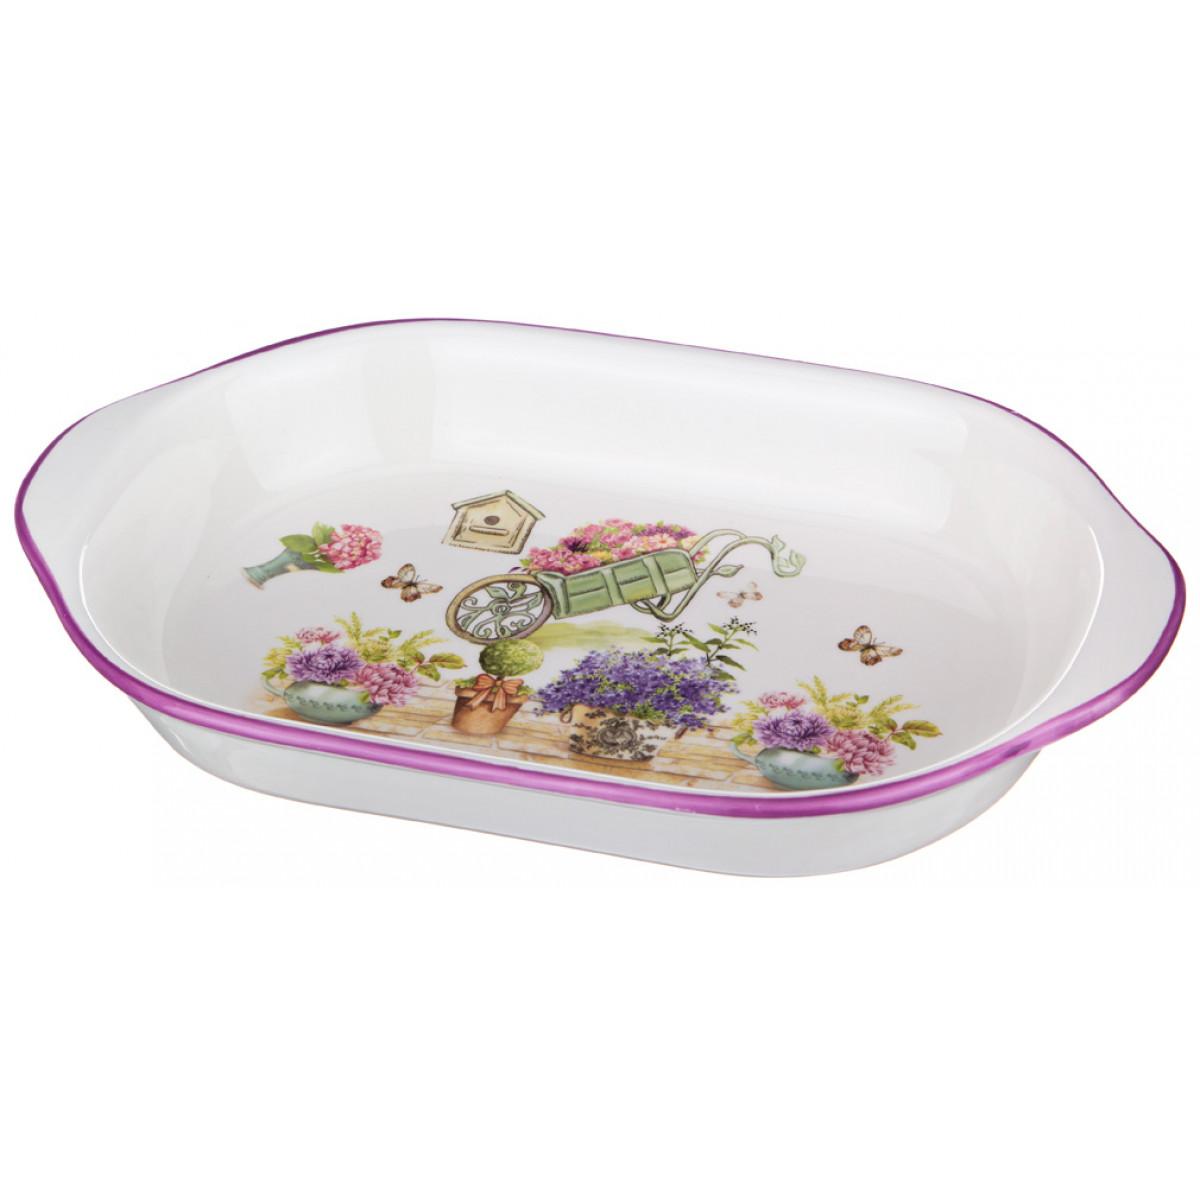 {} Agness Сервиз Bob (5х18х28 см) блюдо шубница корейская роза 29 18 5 см